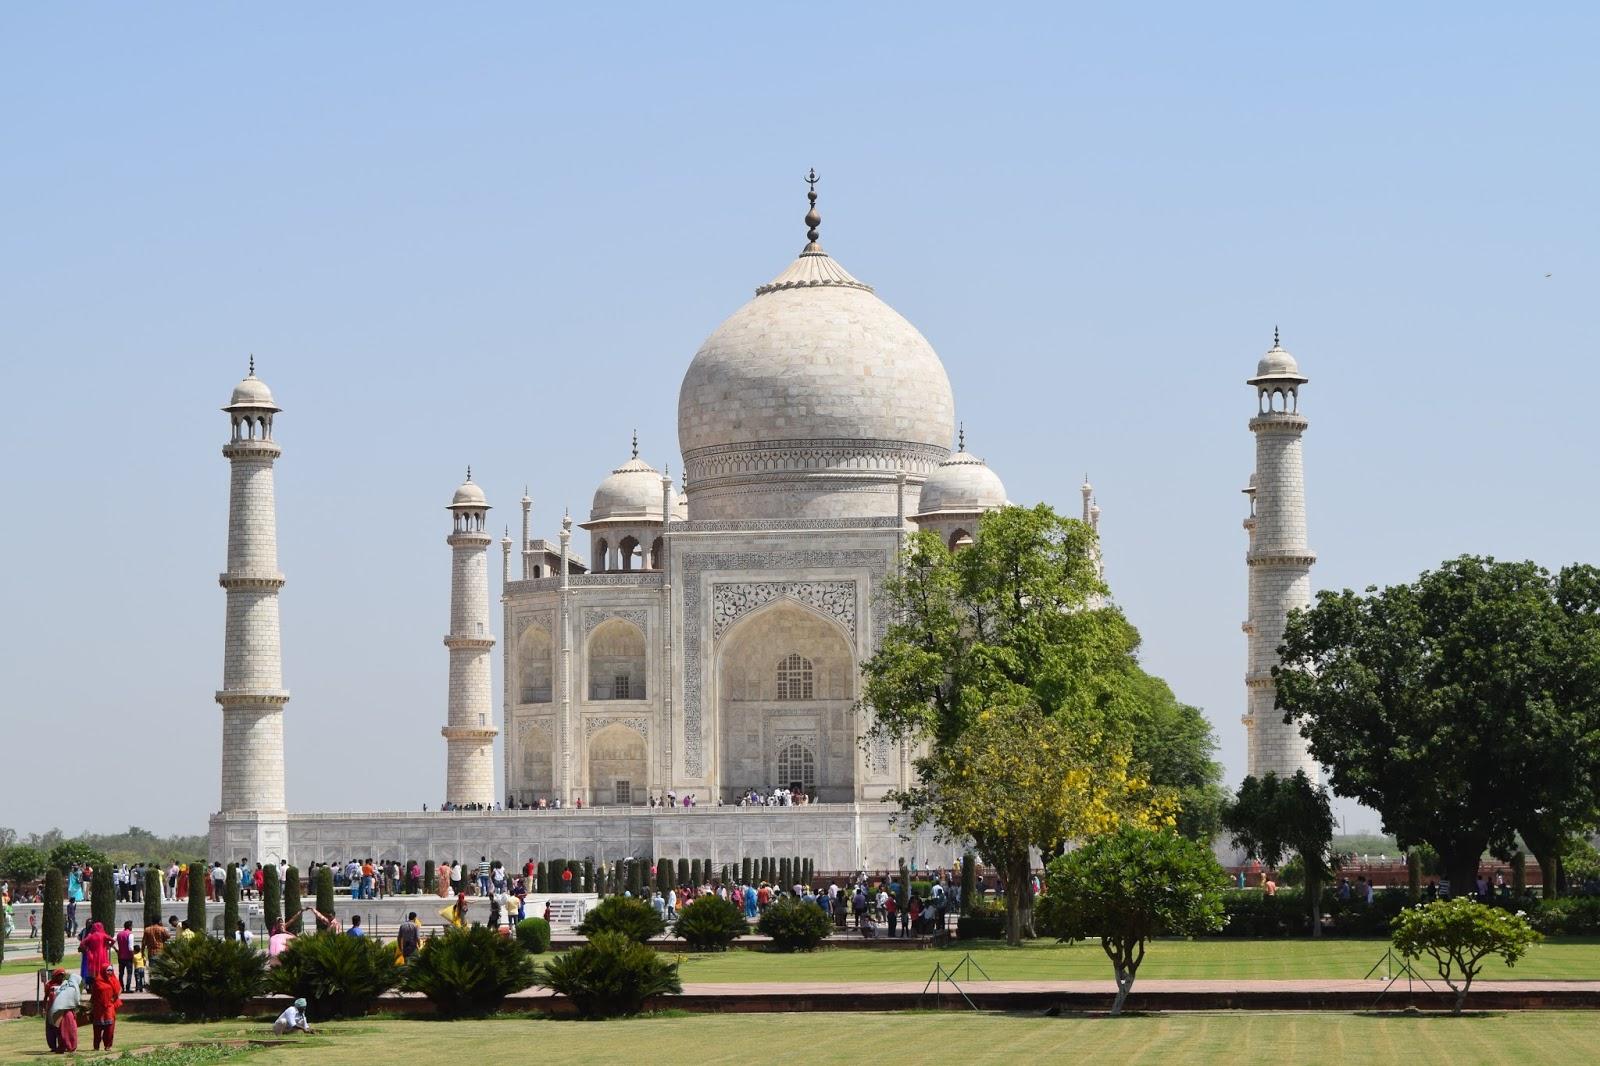 Tips For visiting Taj Mahal | Taj Mahal Pictures - Tips; how long do you need at the taj mahal and How long do you need at the taj mahal